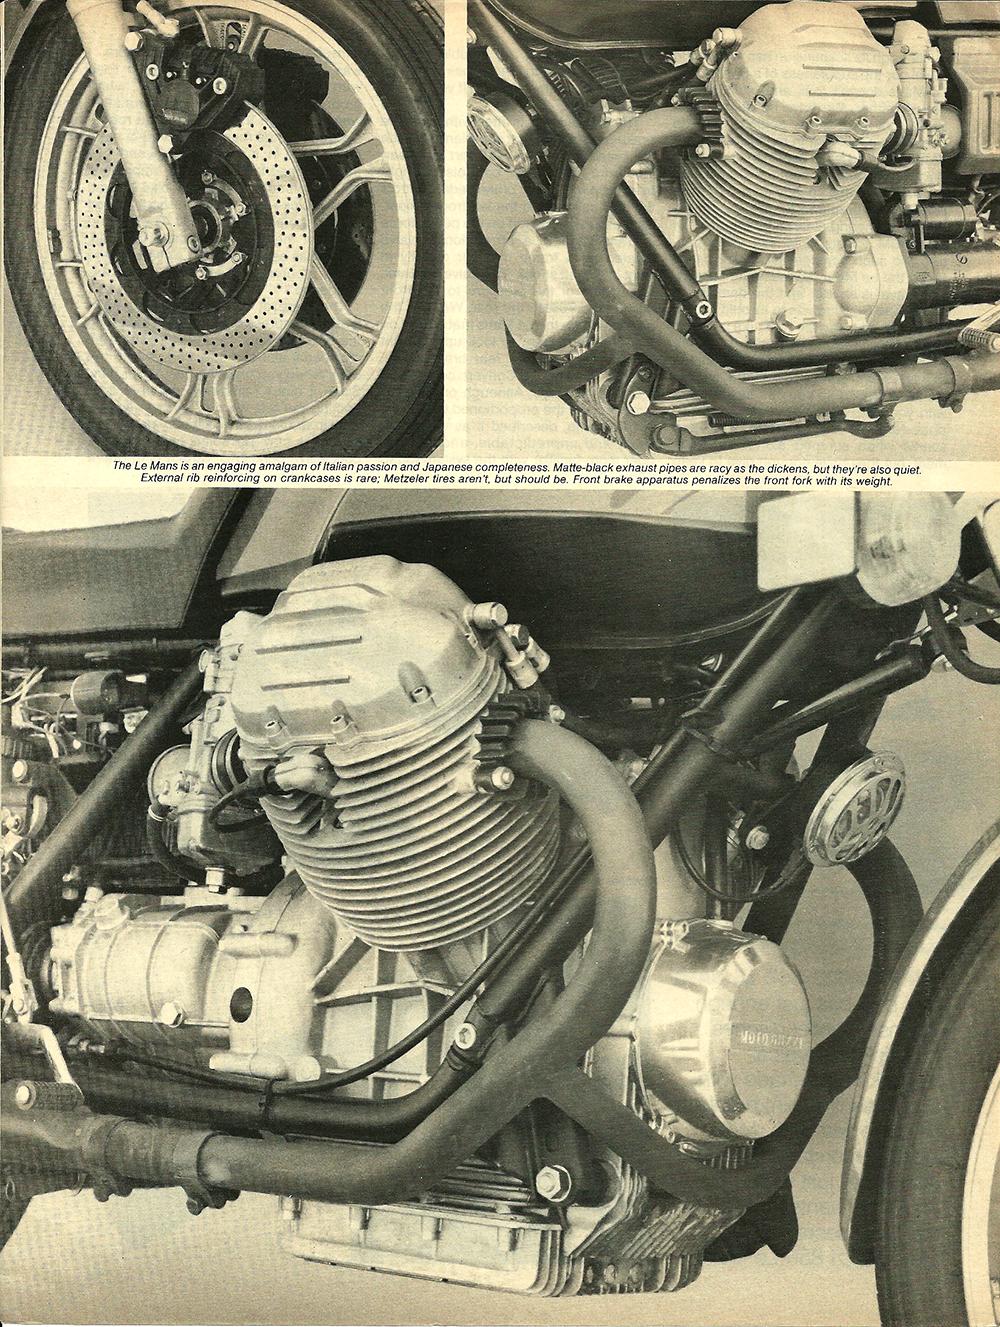 1977 Moto Guzzi 850 LeMans road test 04.jpg